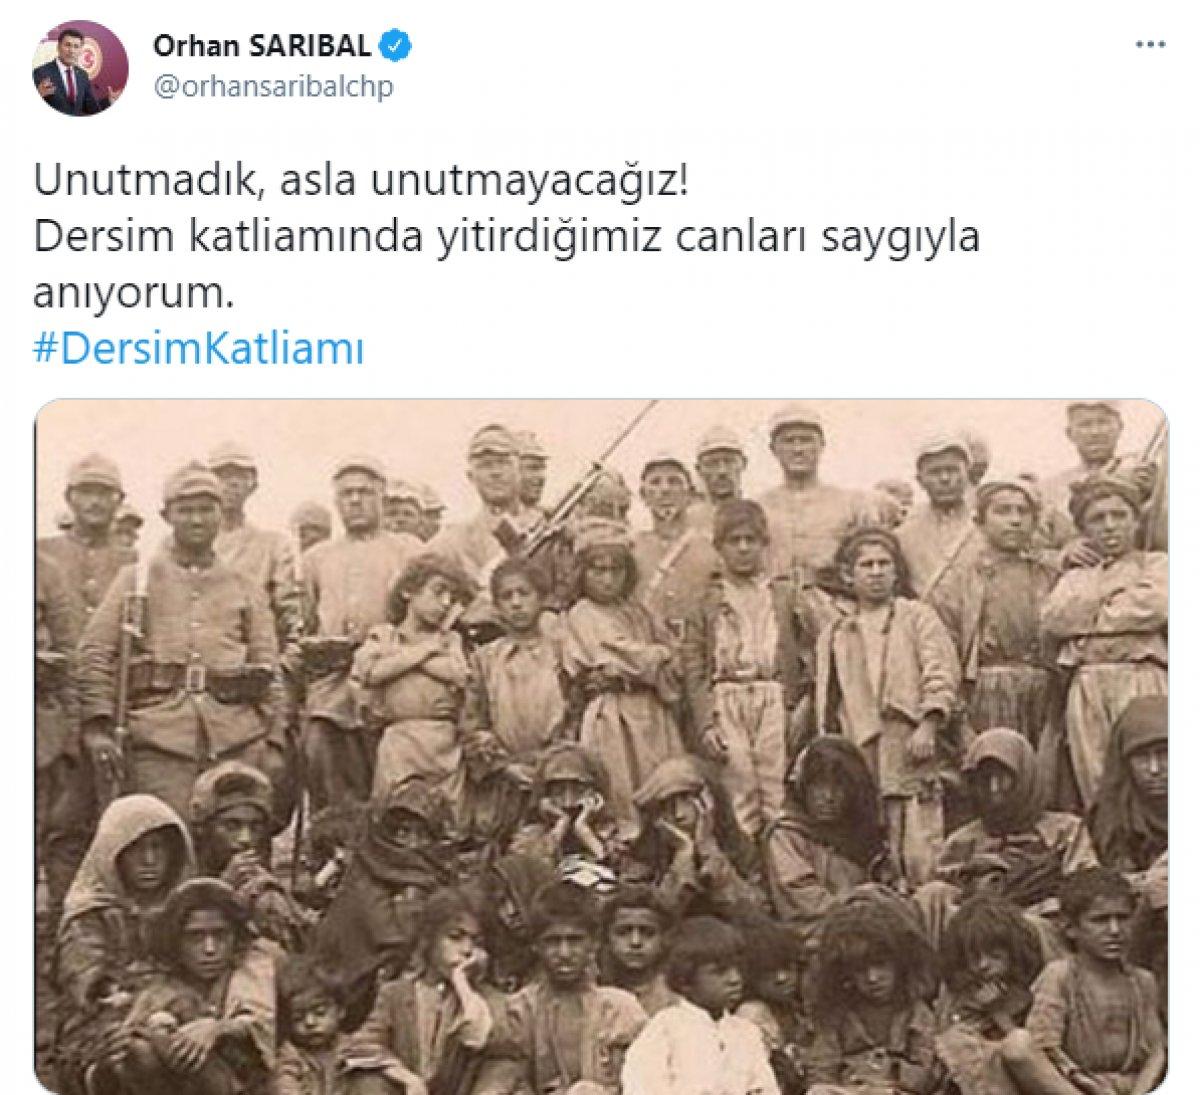 CHP li milletvekilinden tartışma yaratan paylaşım  #1